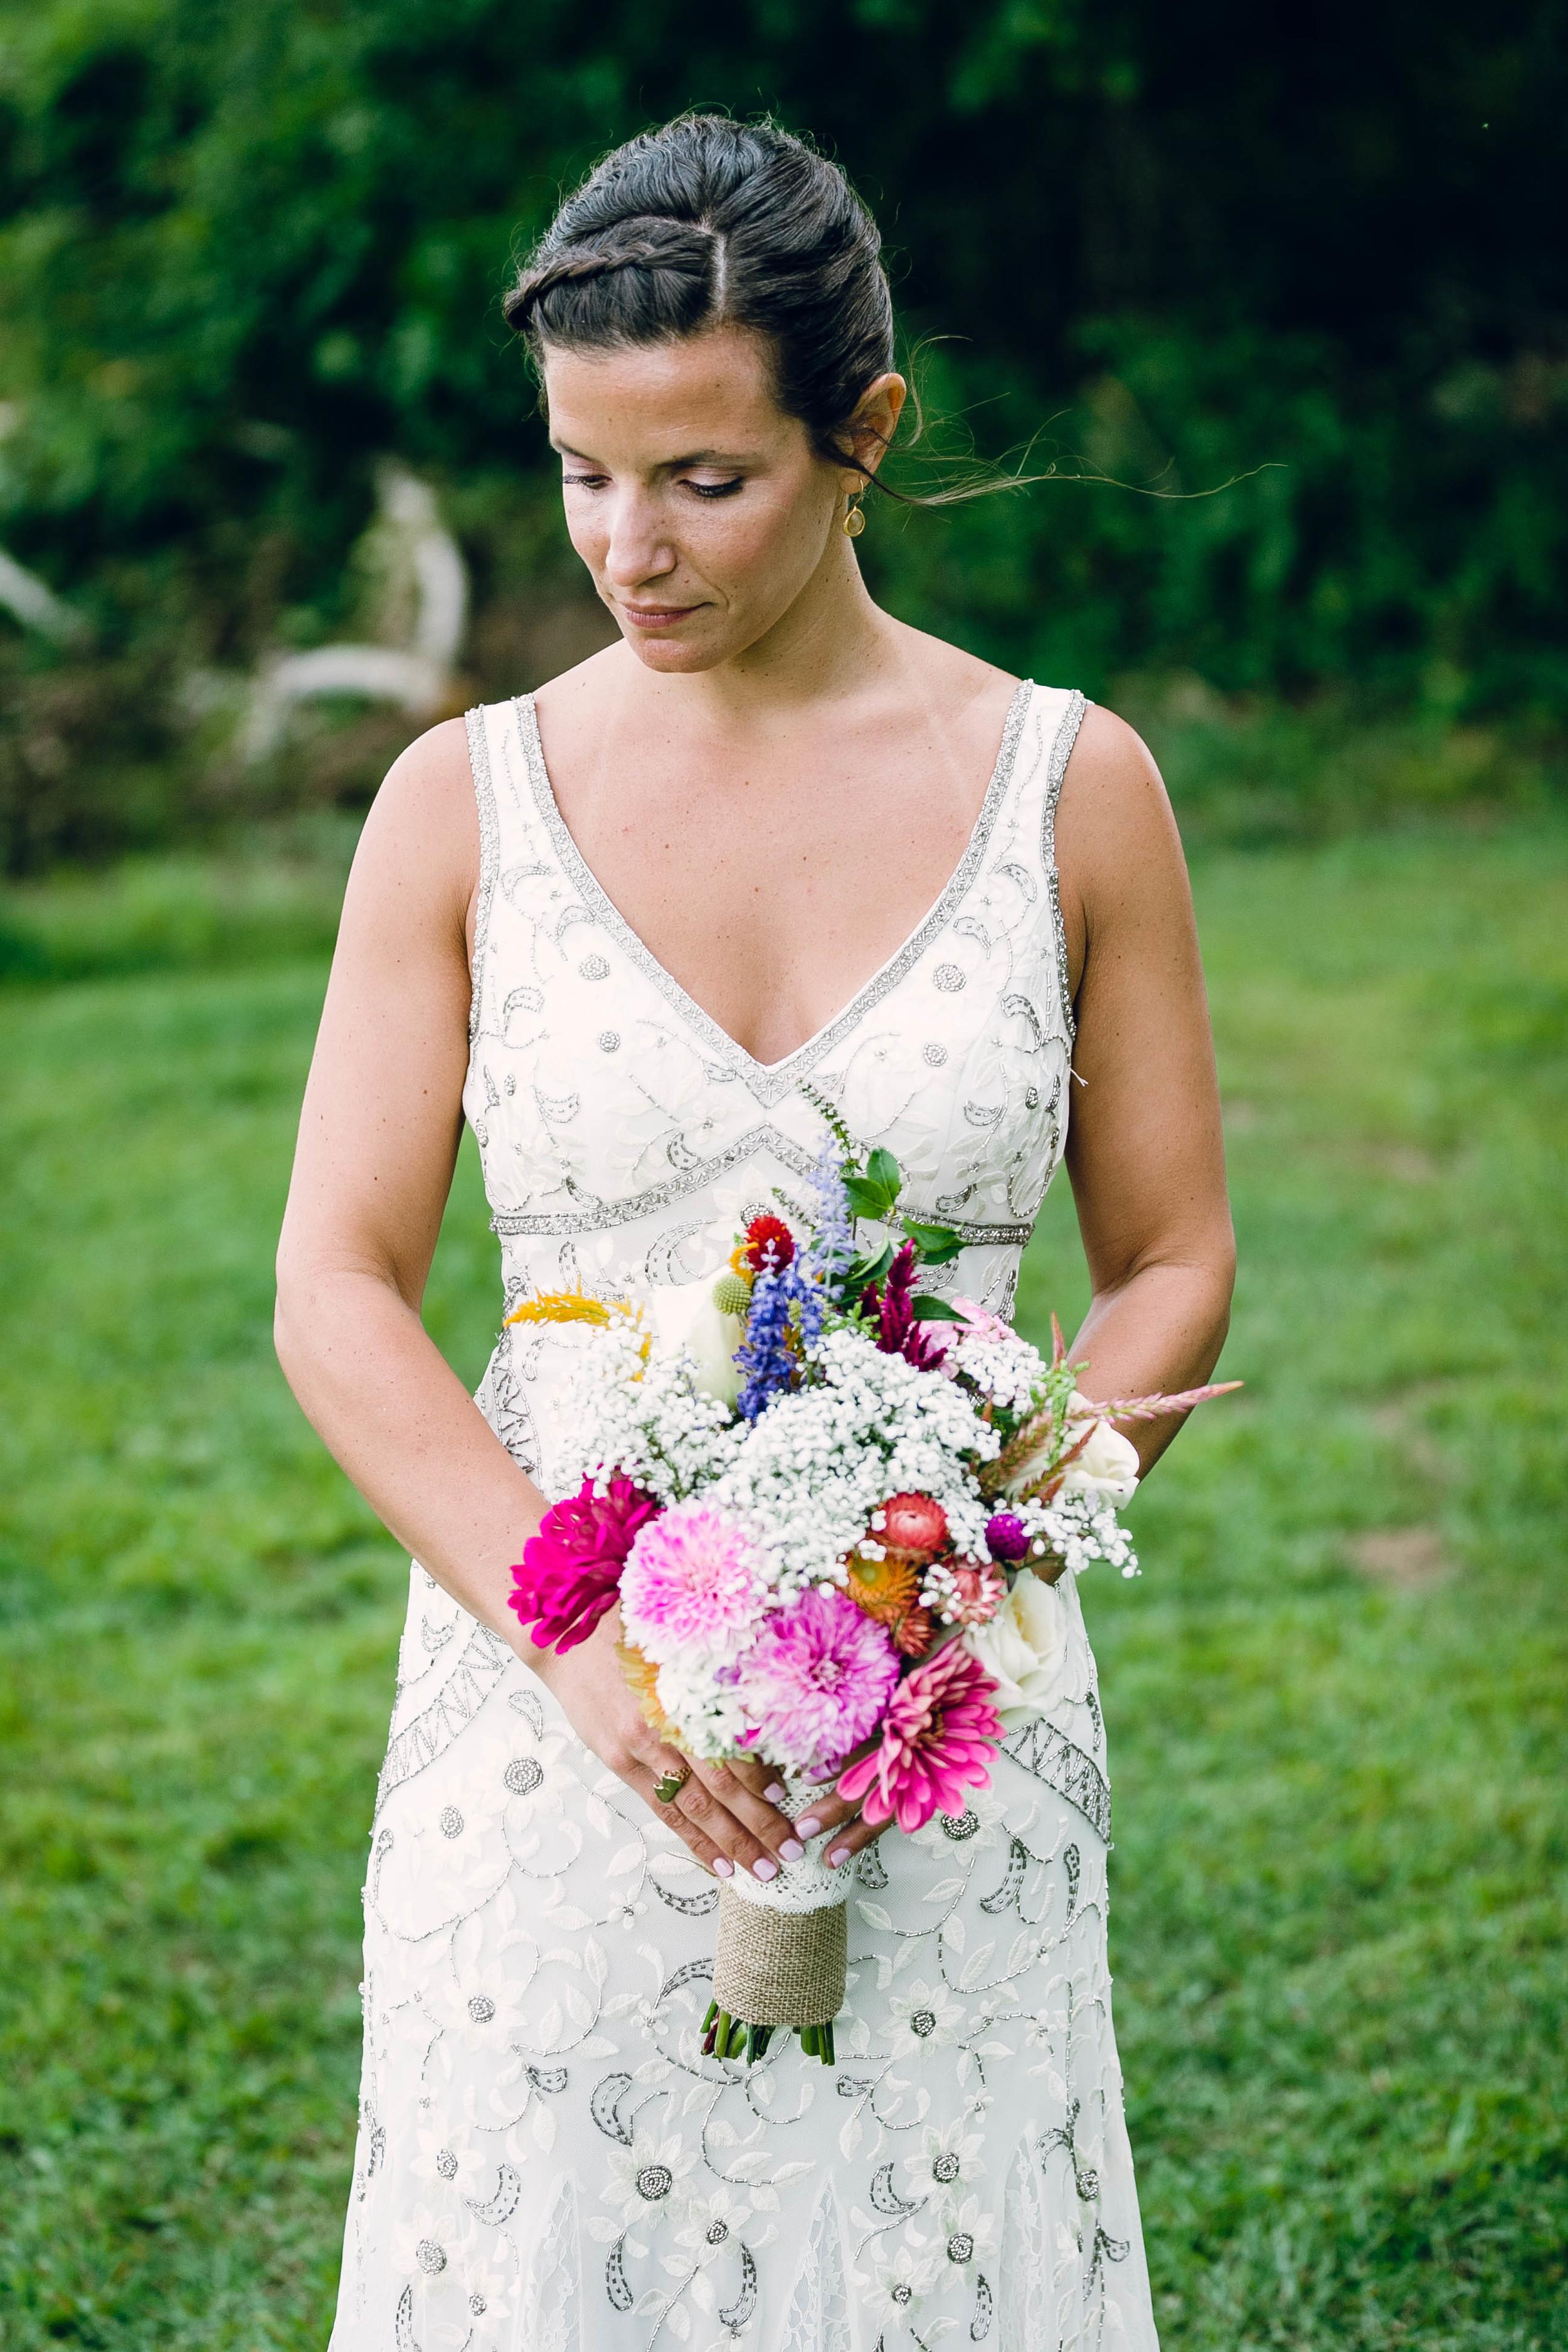 Rustic-Country-Style-Wedding-Connecticut-Farm-Photojornalistic-Wedding-Photography-by-Jacek-Dolata-6.jpg